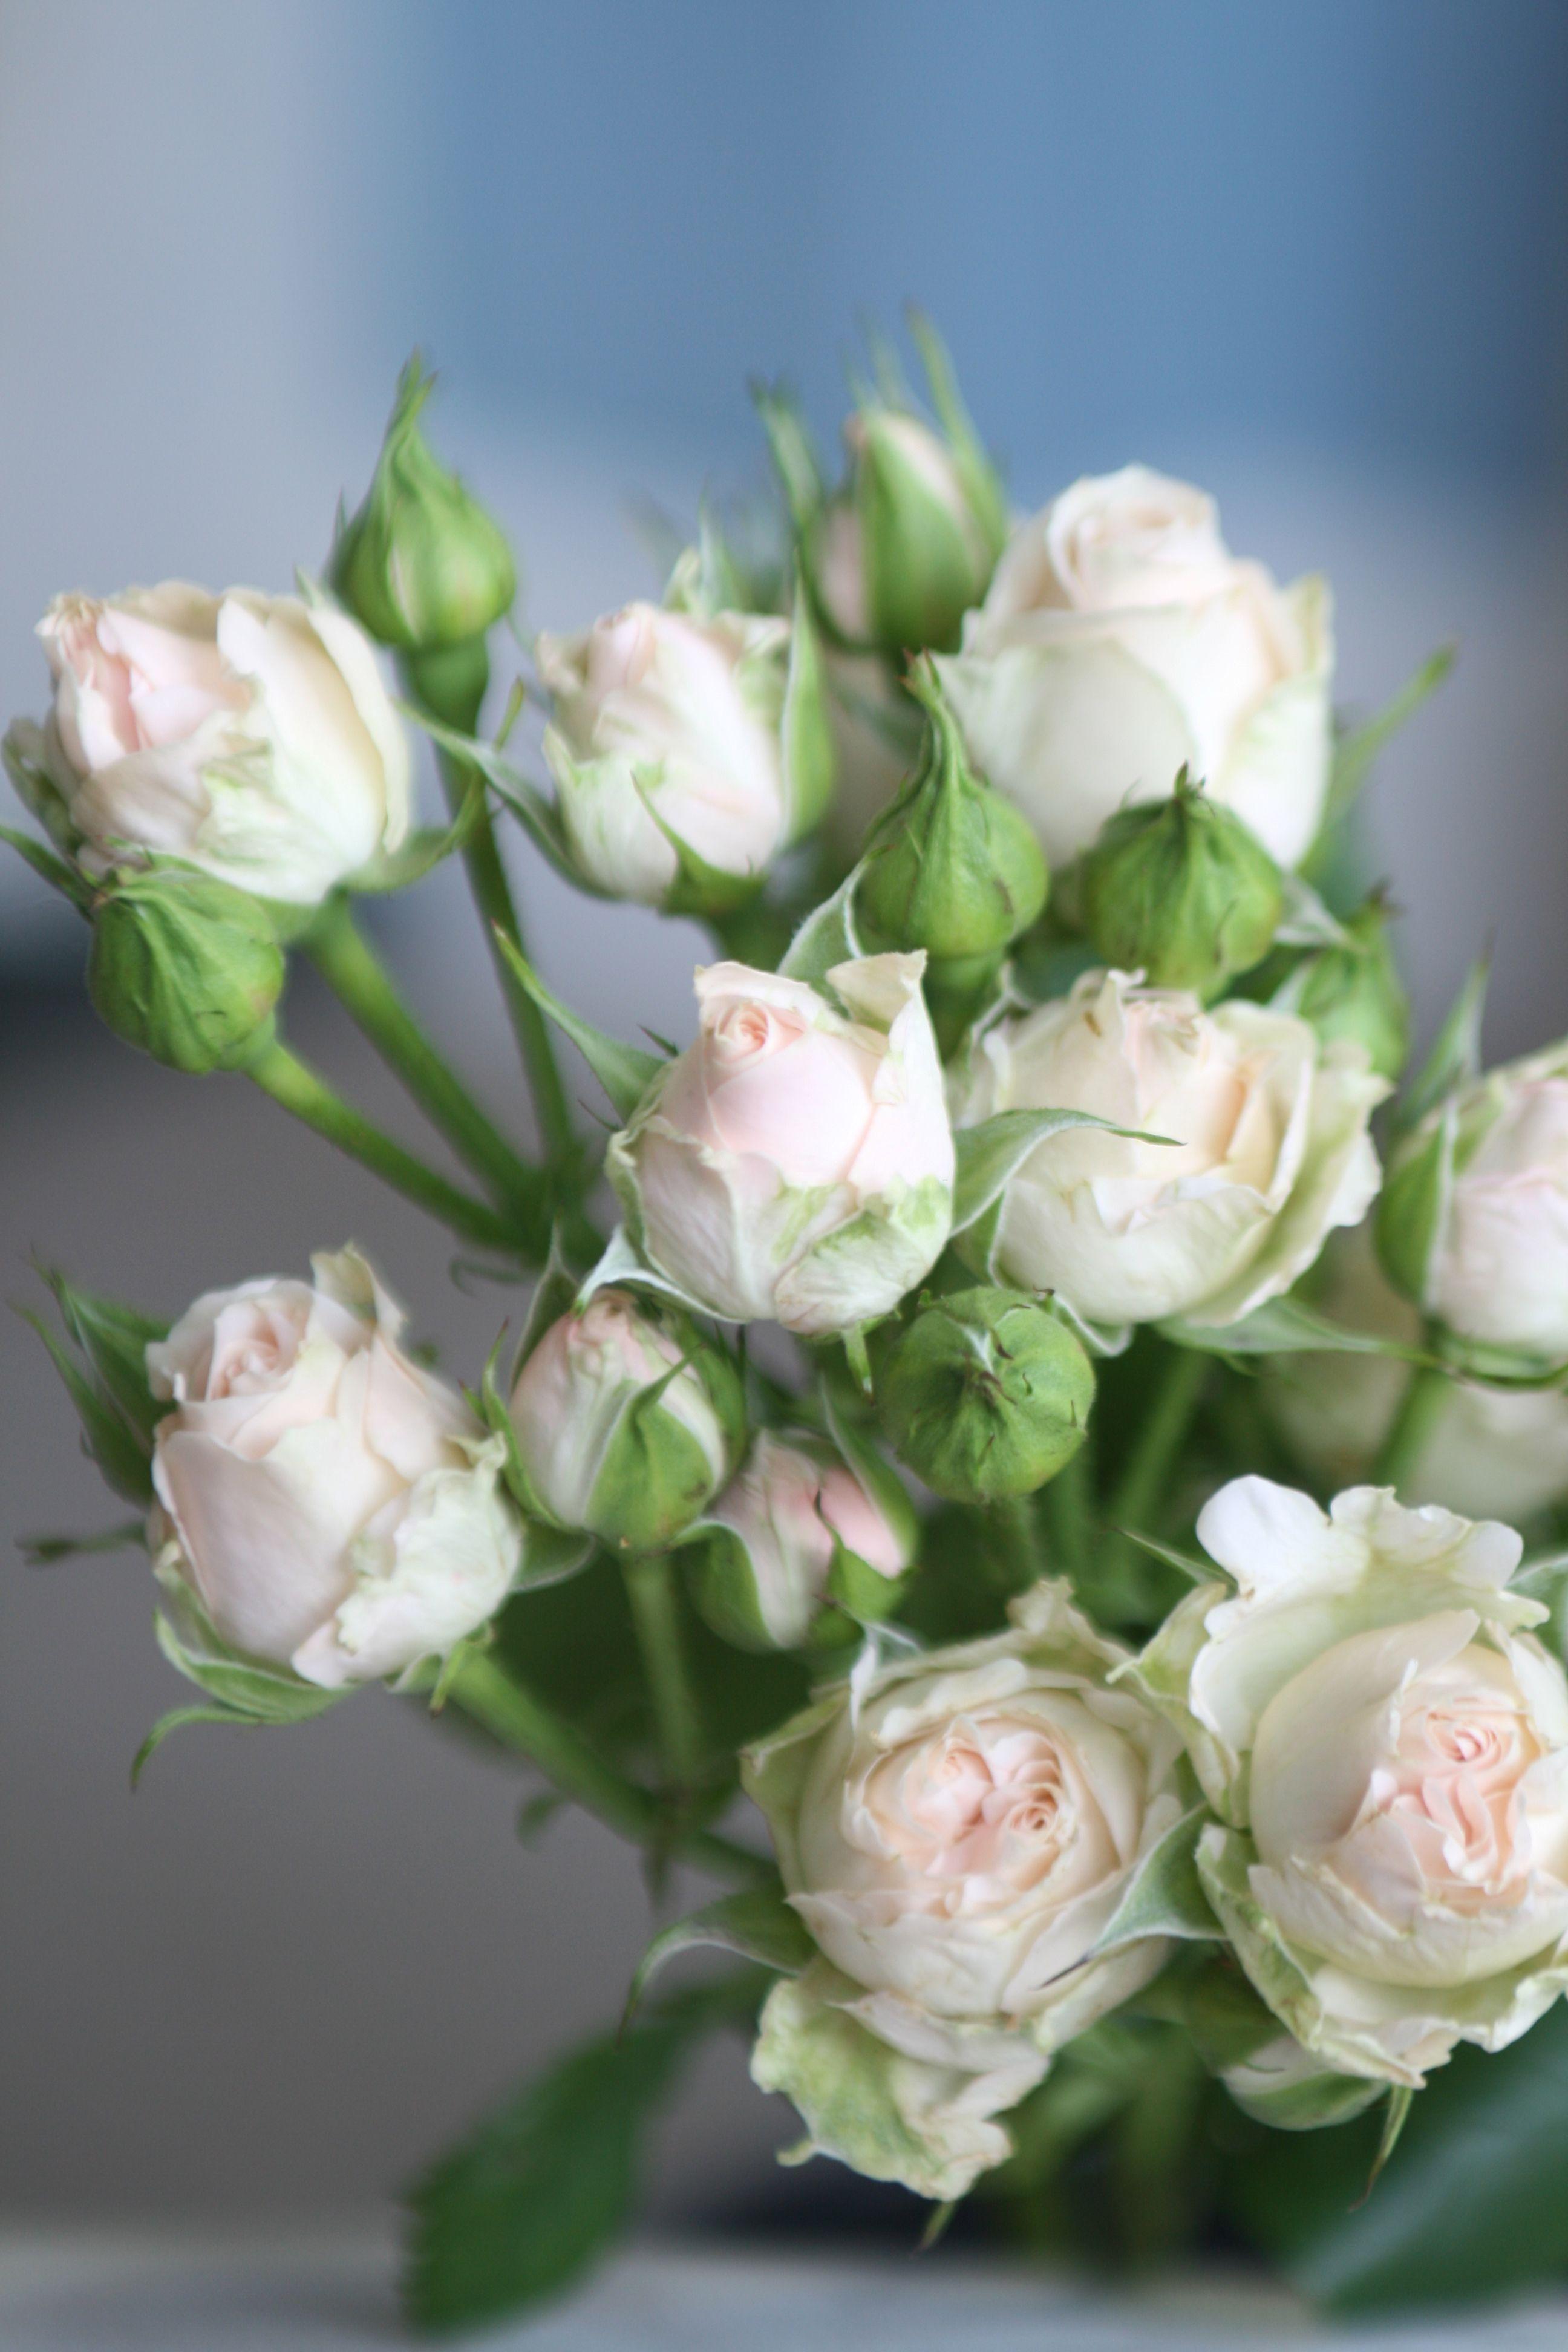 Peach spray roses. VarietyJana Flowers, Love flowers